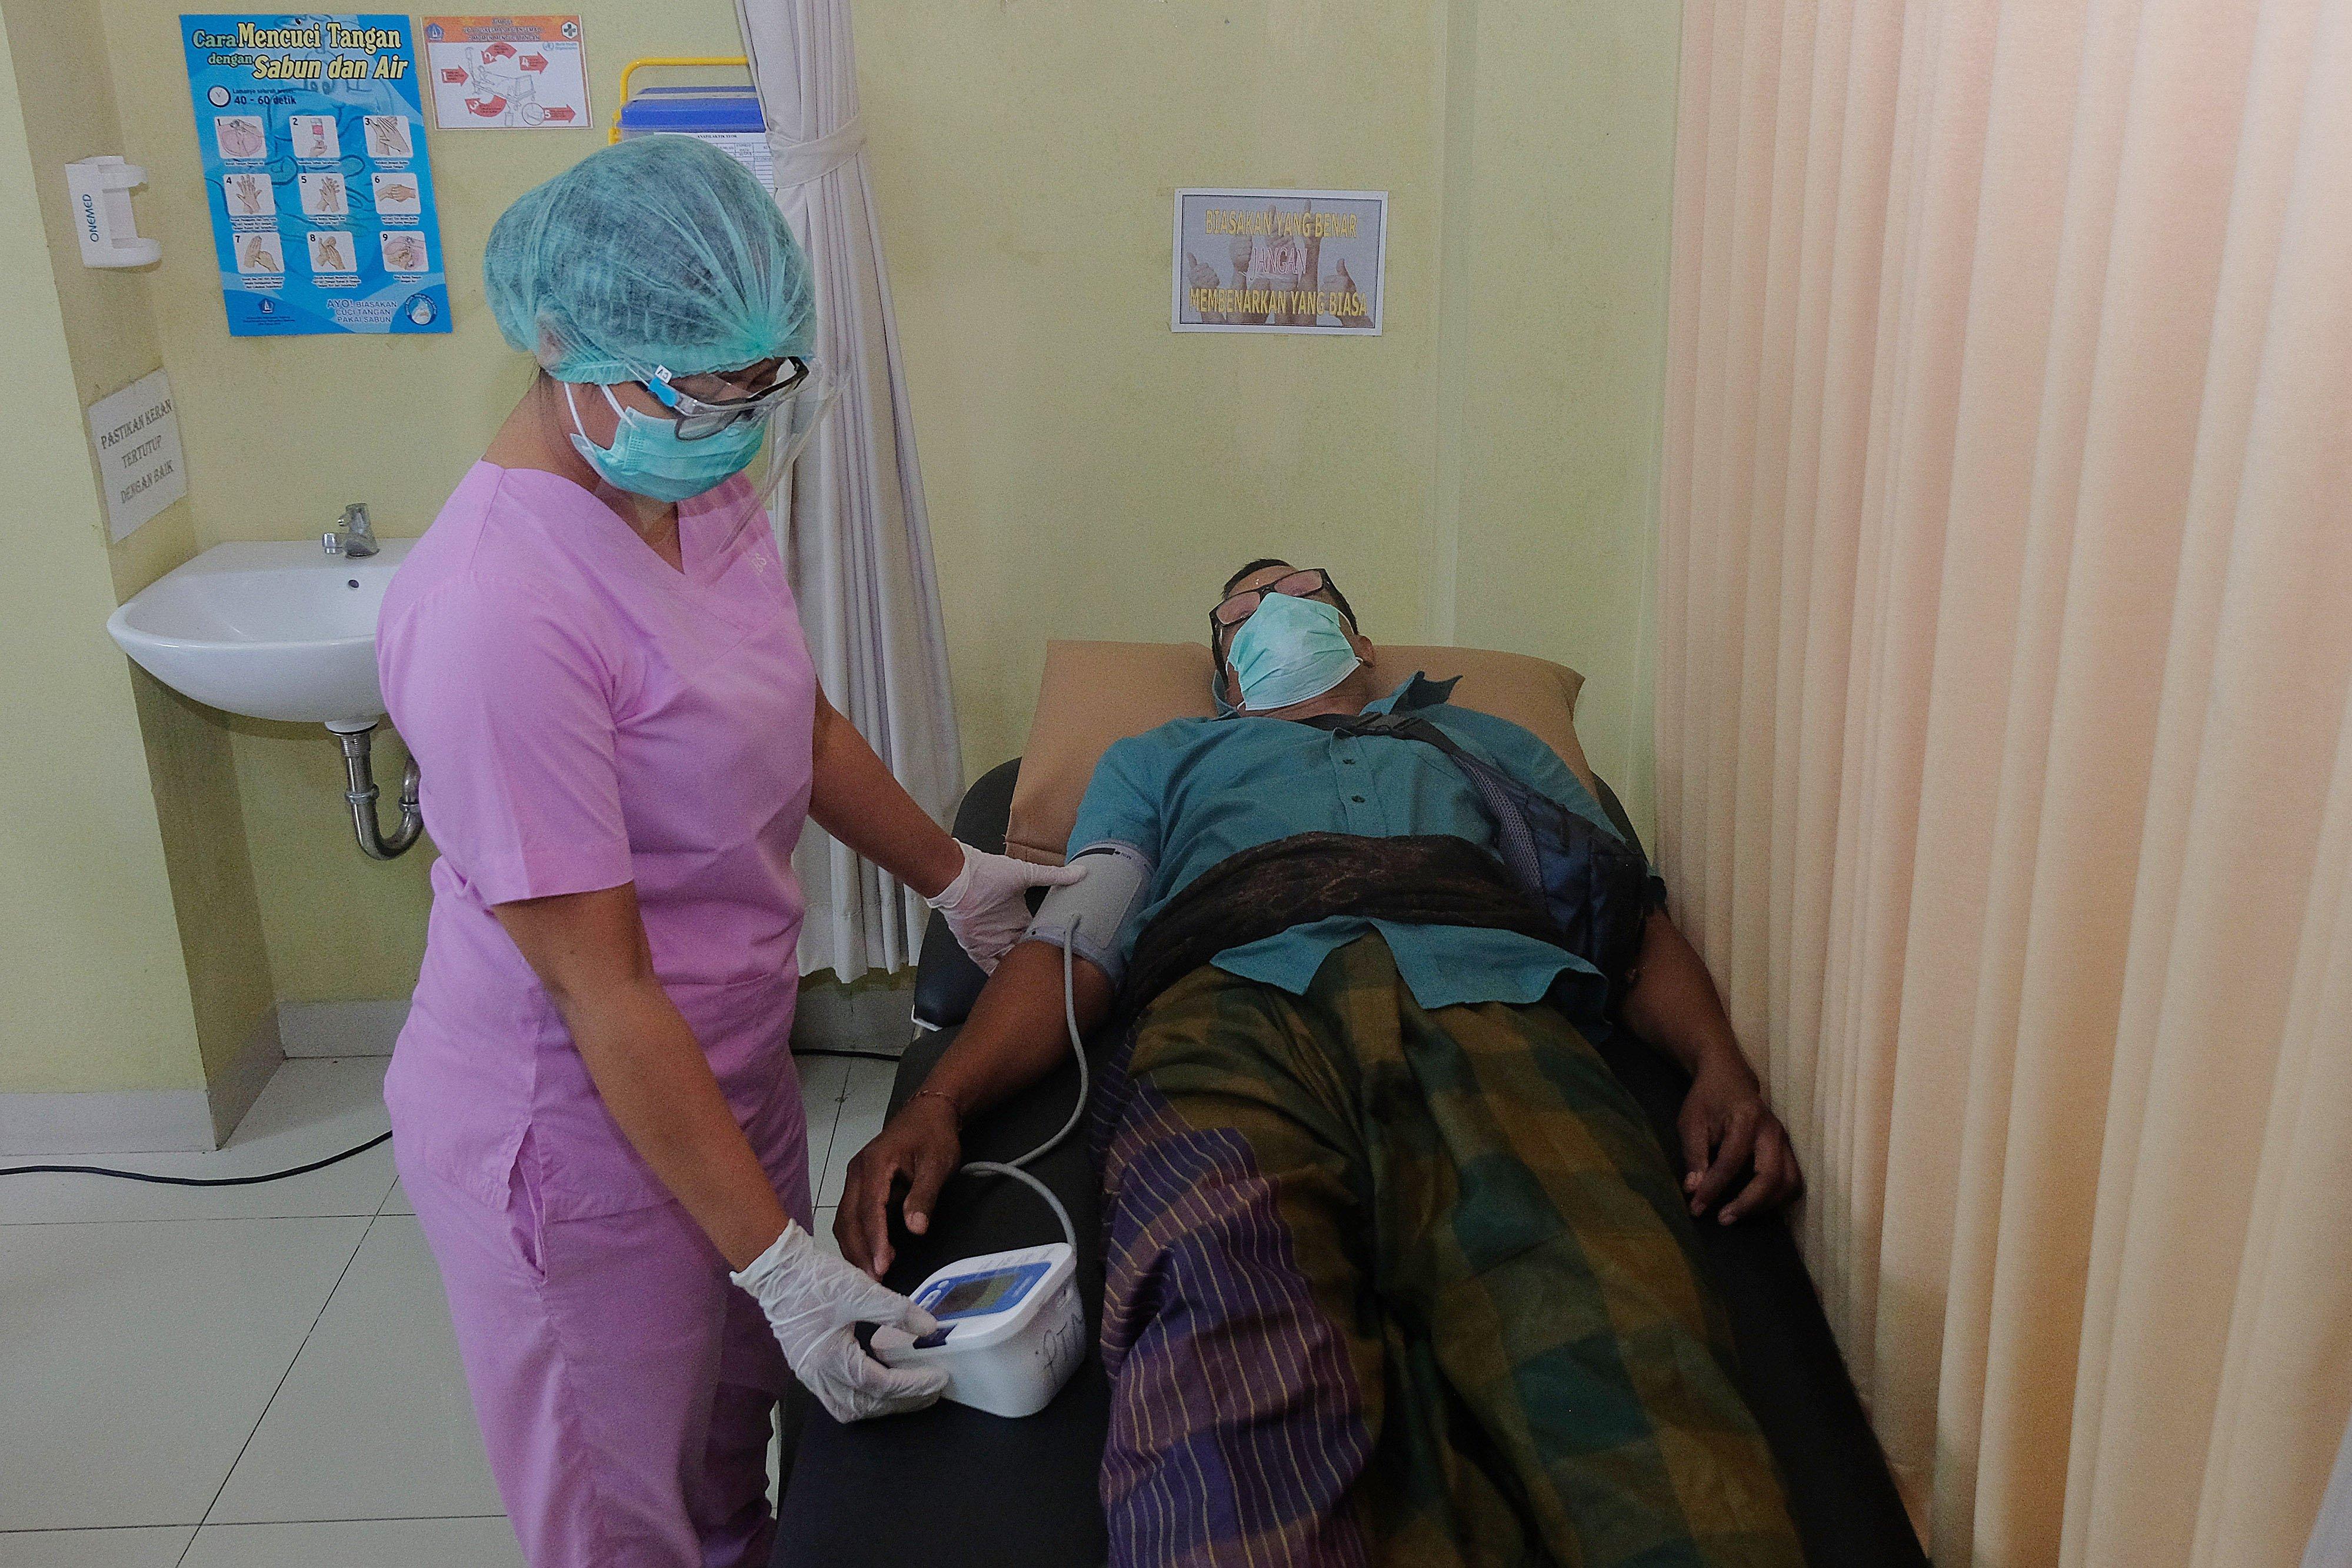 Tim medis memeriksa tensi warga dengan komorbid dalam simulasi uji coba vaksinasi COVID-19 di Puskesmas Abiansemal I, Badung, Bali, Selasa (6/10/2020). Simulasi uji coba vaksinasi COVID-19 yang diikuti puluhan warga tersebut untuk mengukur kesiapan dan kesigapan para tim medis di puskesmas itu yang rencananya dikunjungi Presiden Republik Indonesia Joko Widodo pada awal tahun depan.